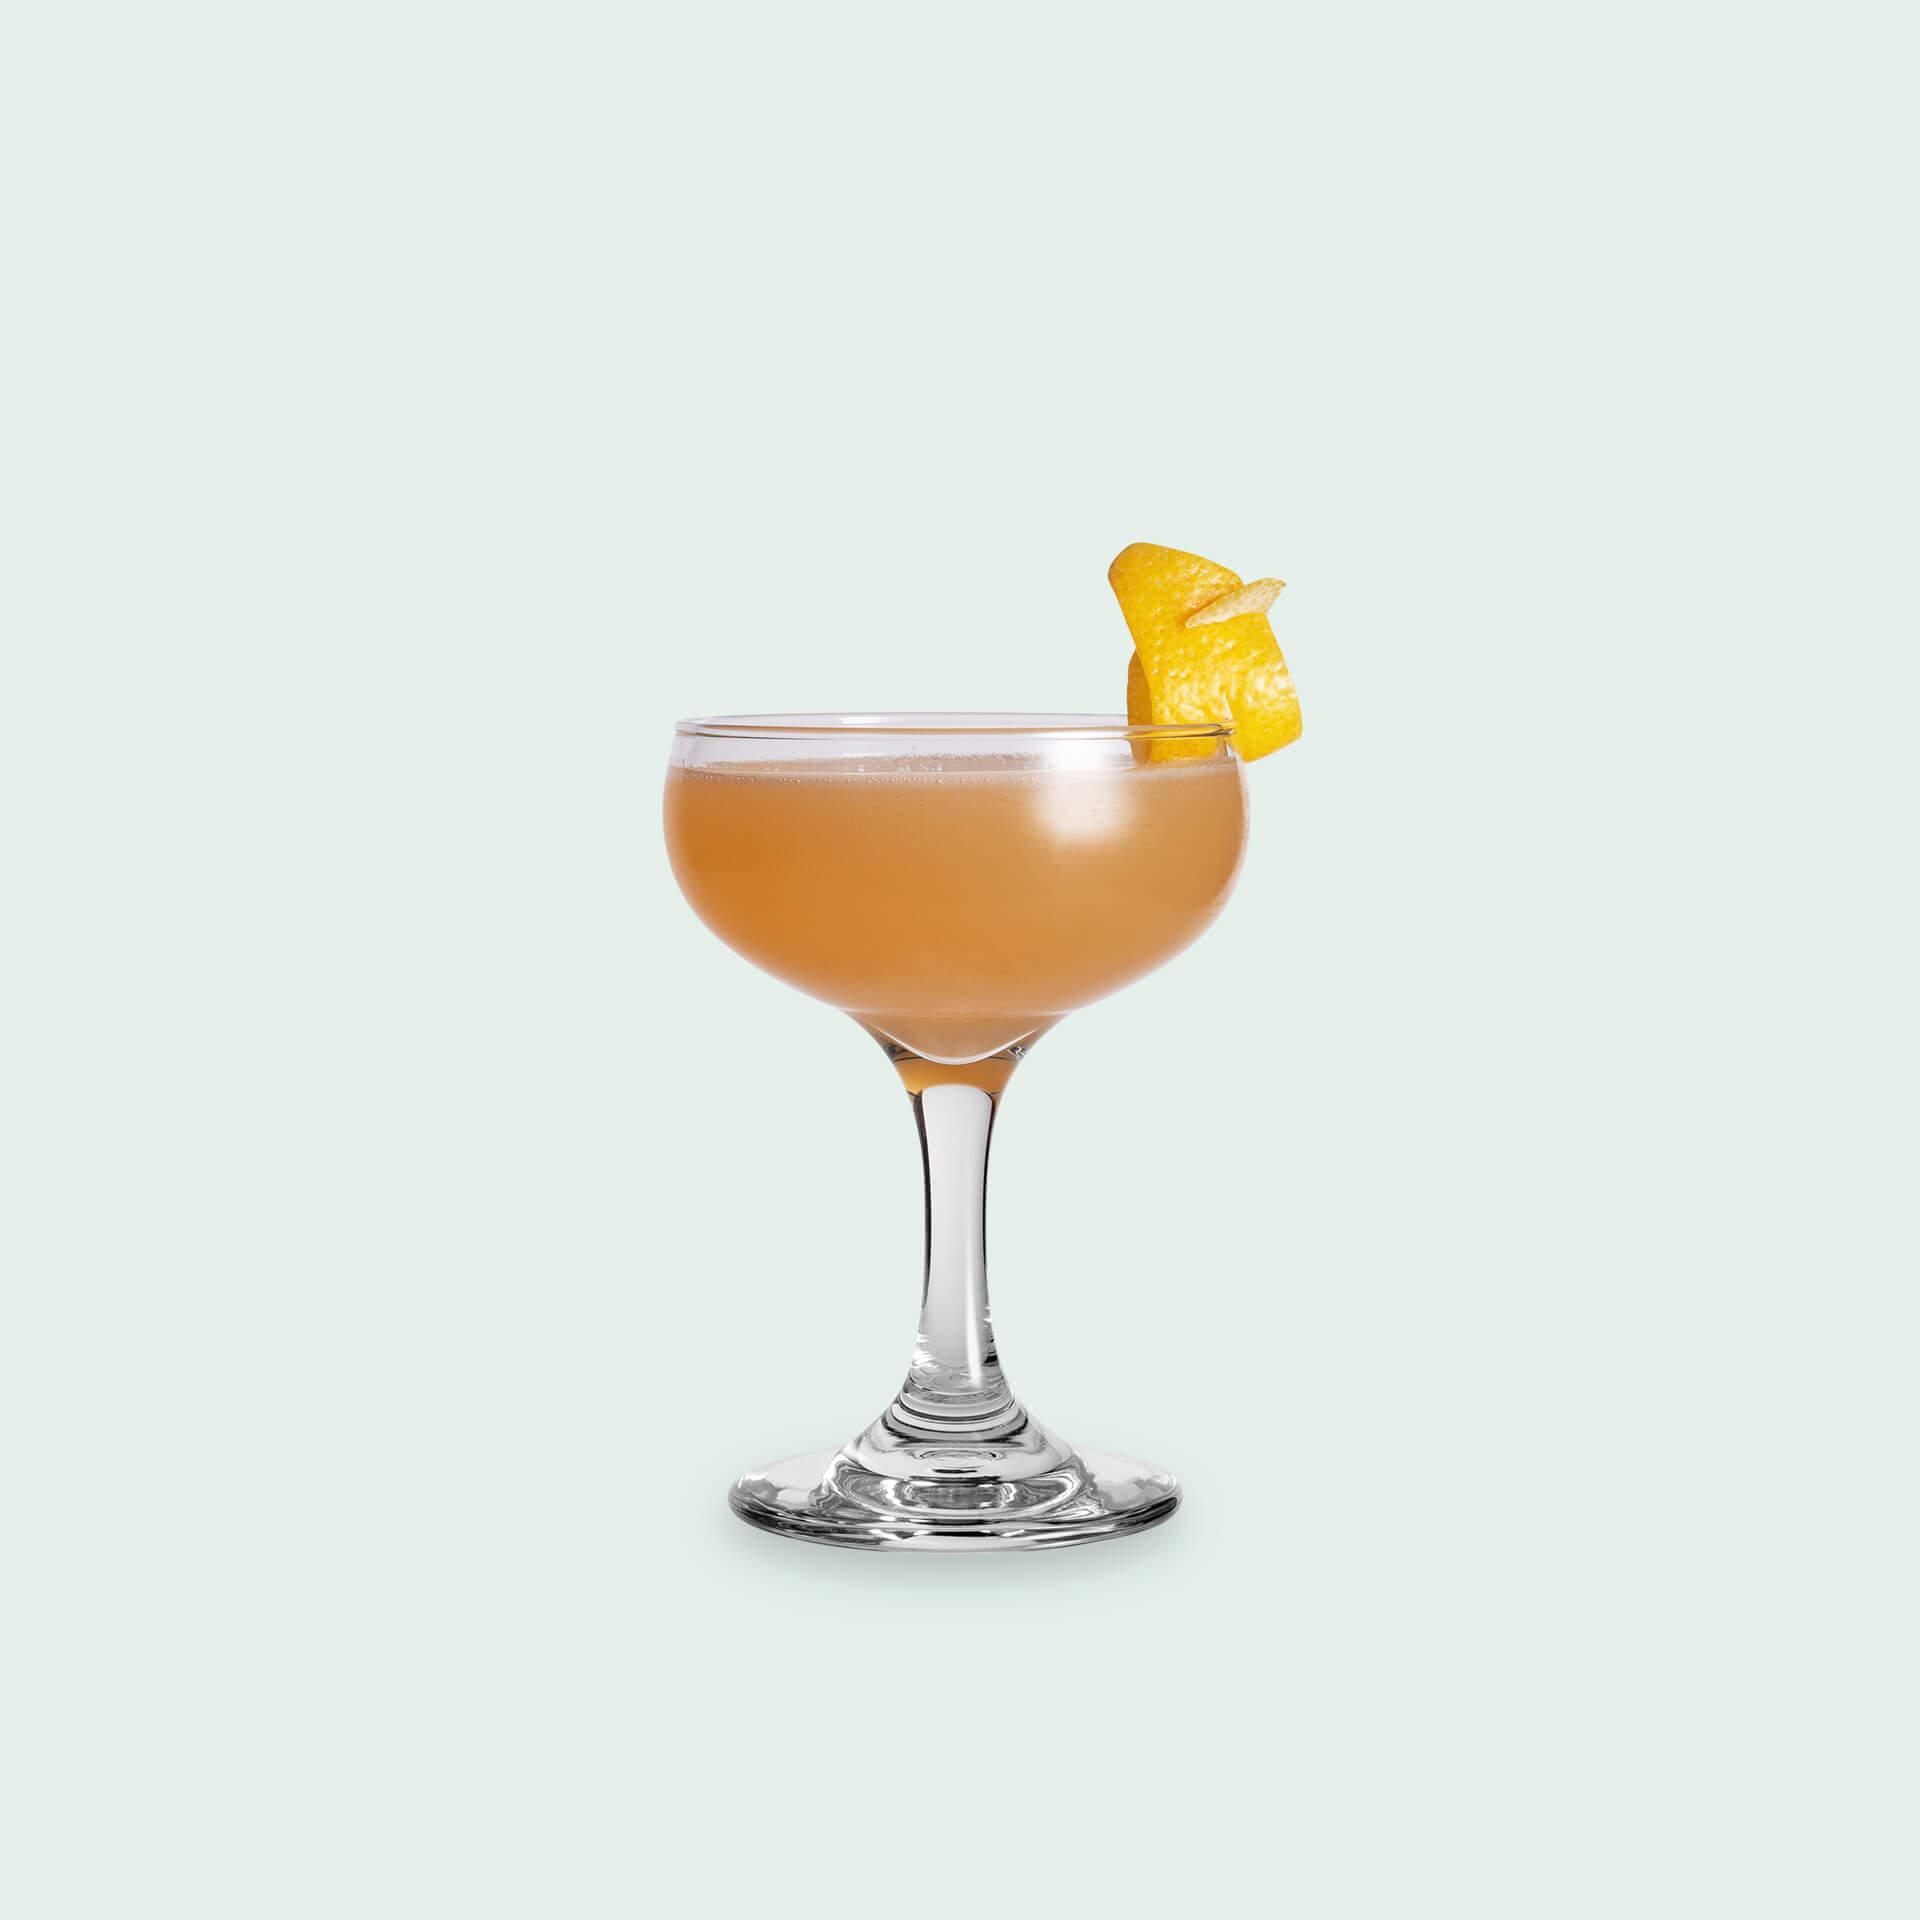 Cedar Smoked Corpse Reviver No 2 von Drink Syndikat